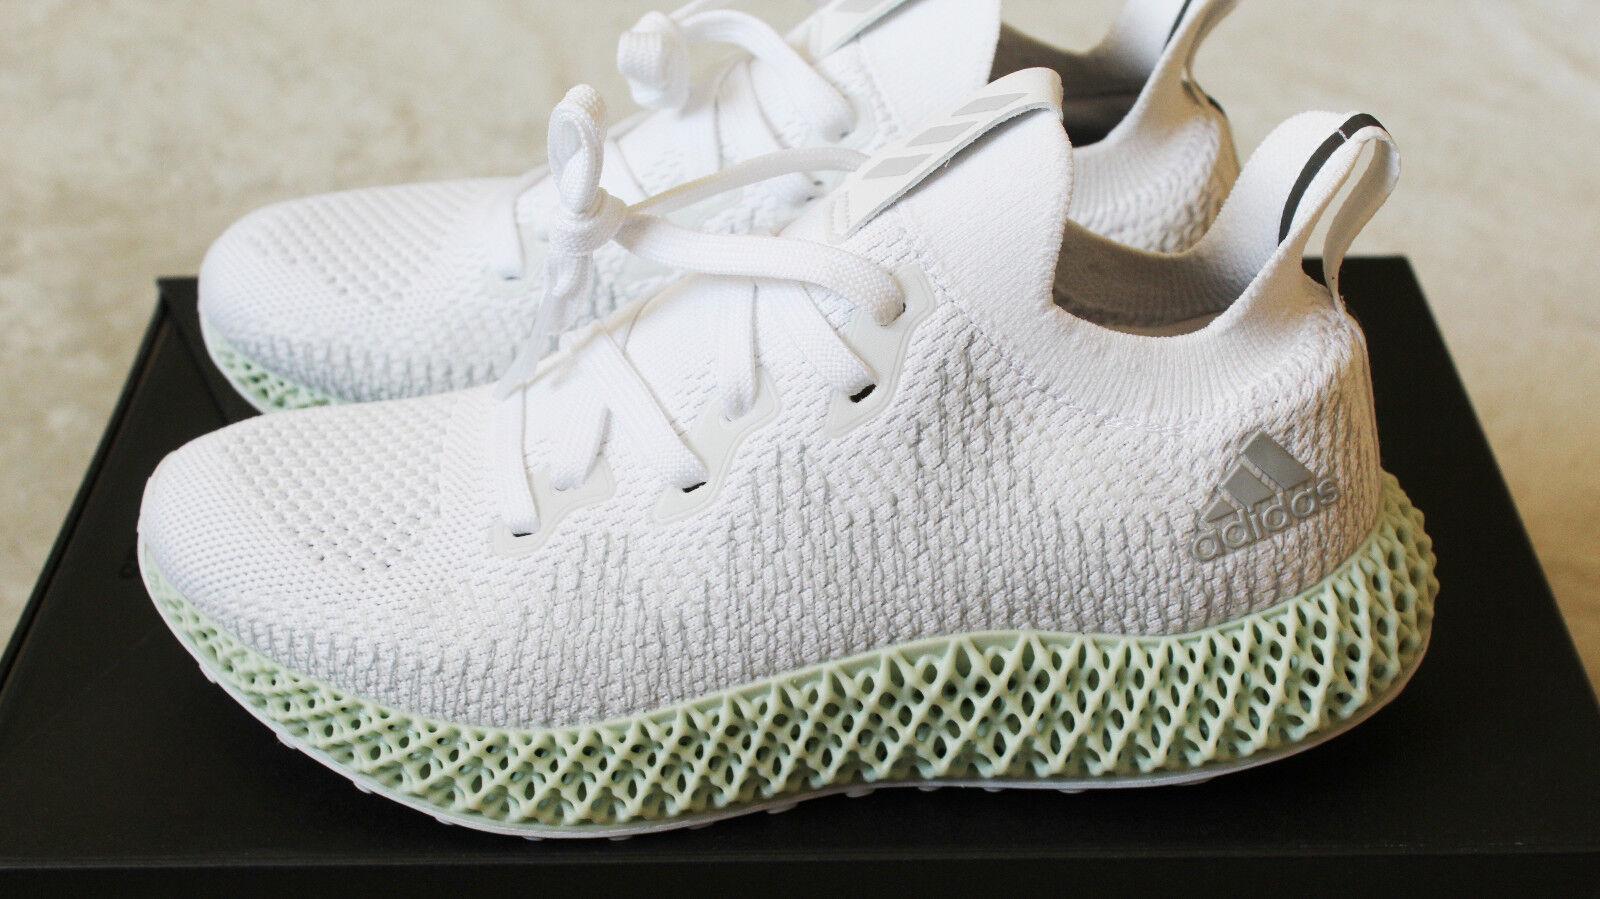 New Adidas Alphaedge 4D White Grey Green Futurecraft UK 3.5 US 4 W 5 EU 36